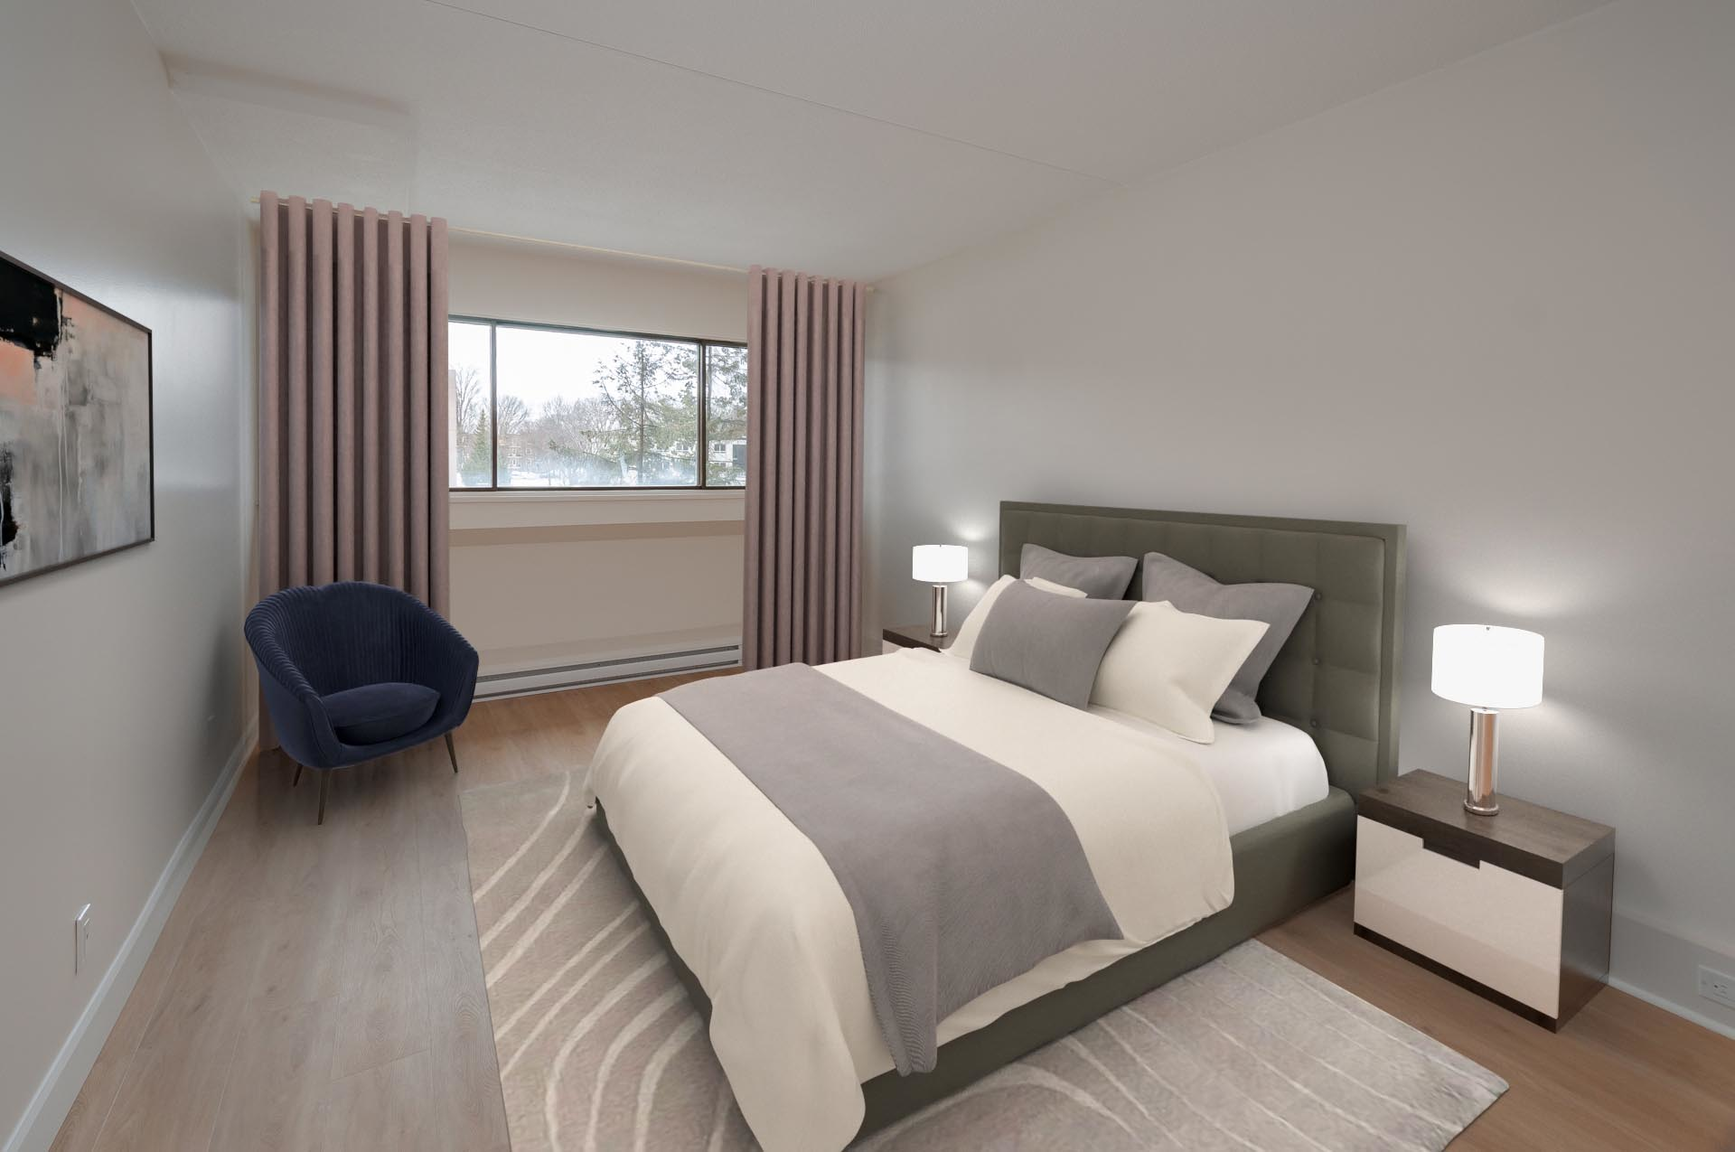 2 bedroom Apartments for rent in Quebec City at Les Jardins de Merici - Photo 17 - RentersPages – L407783